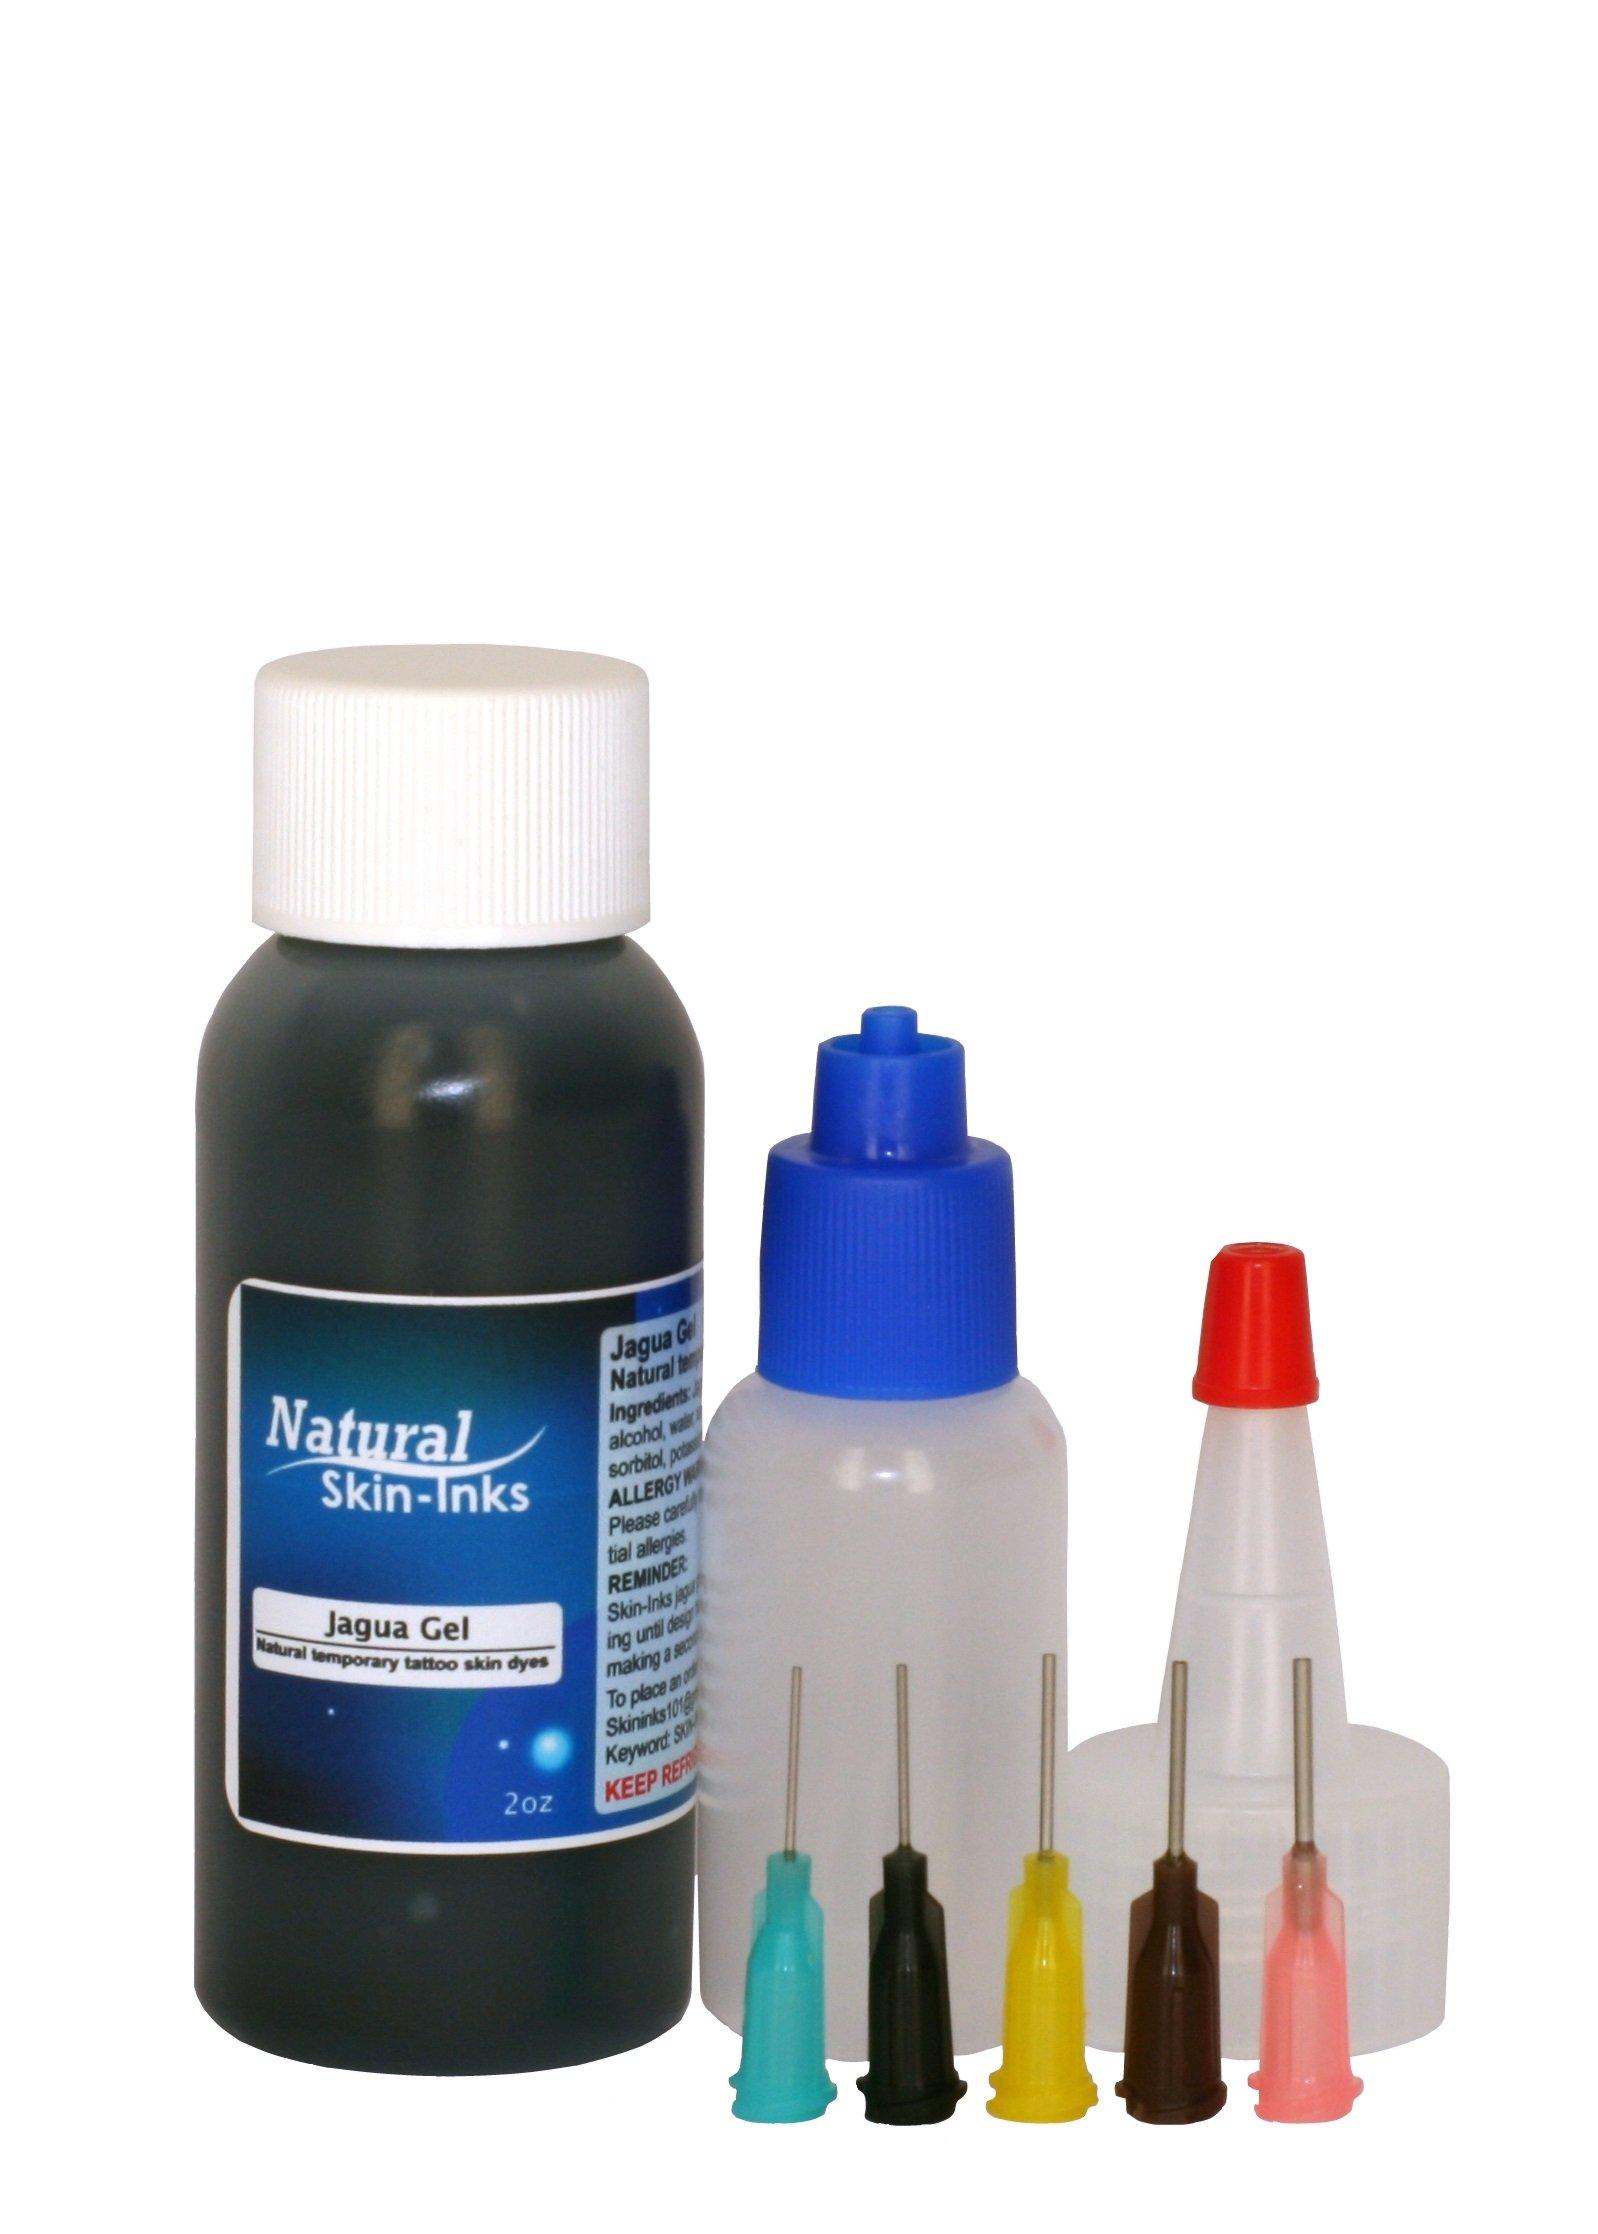 Henna City 2 oz Jagua Gel and Applicator Bottle Plus Free Stencil transfers